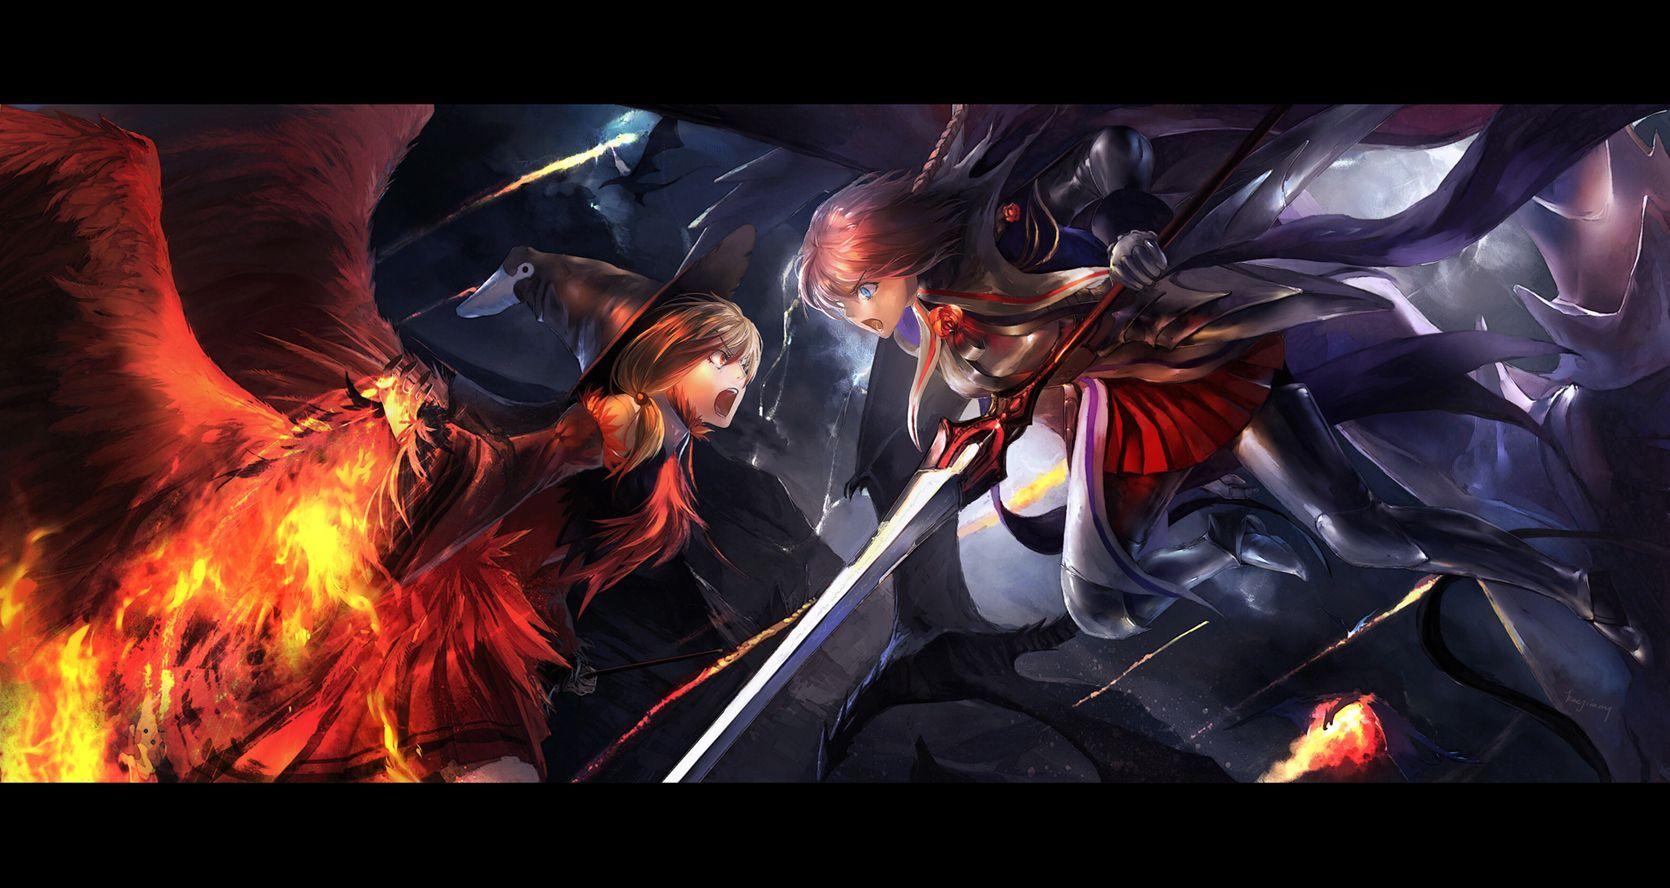 Epic Anime Fighting Wallpaper High Definition Anime Background Anime Wallpaper Anime Epic anime wallpaper full hd